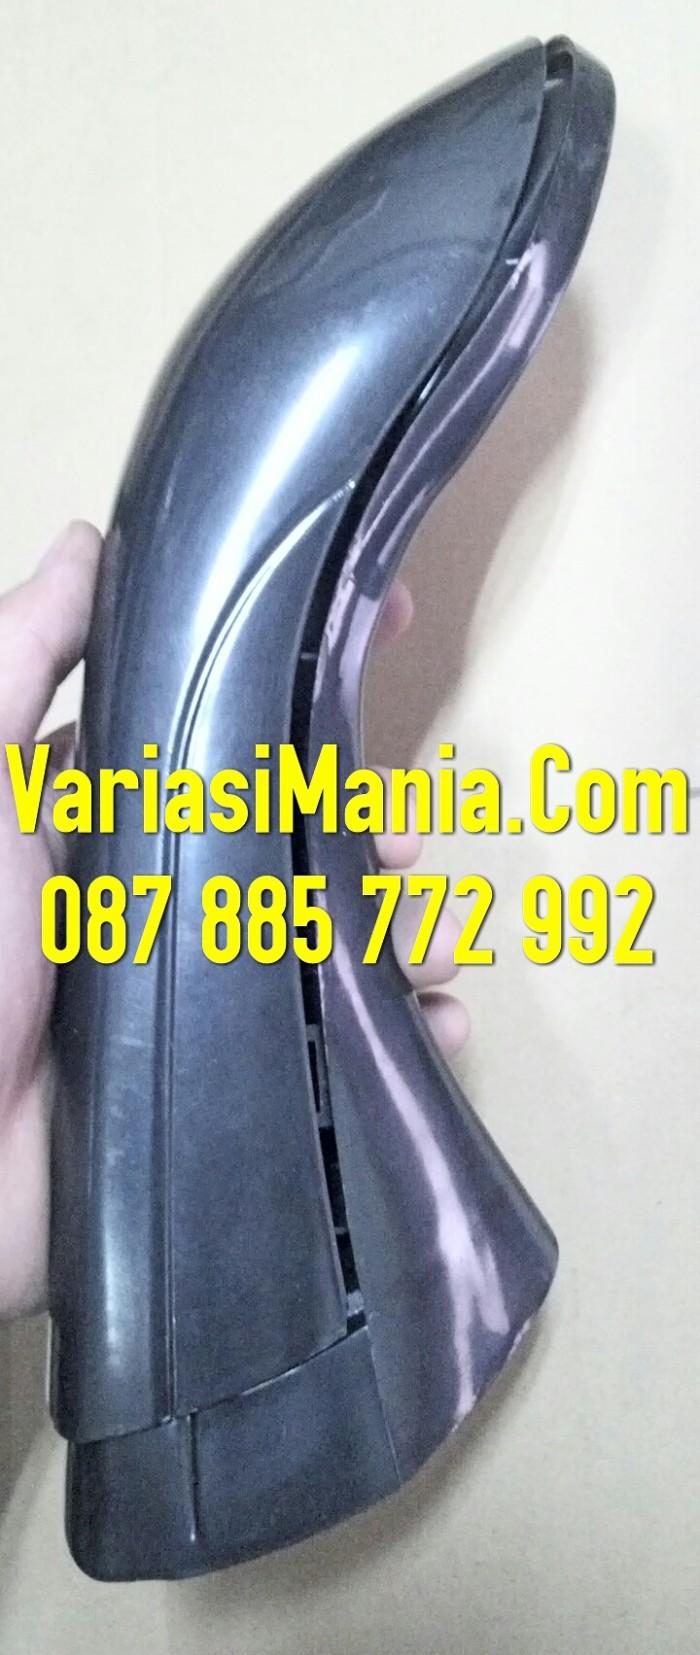 harga Fender mirror/spion kap mesin rush terios cat sesuai warna body mobil Tokopedia.com